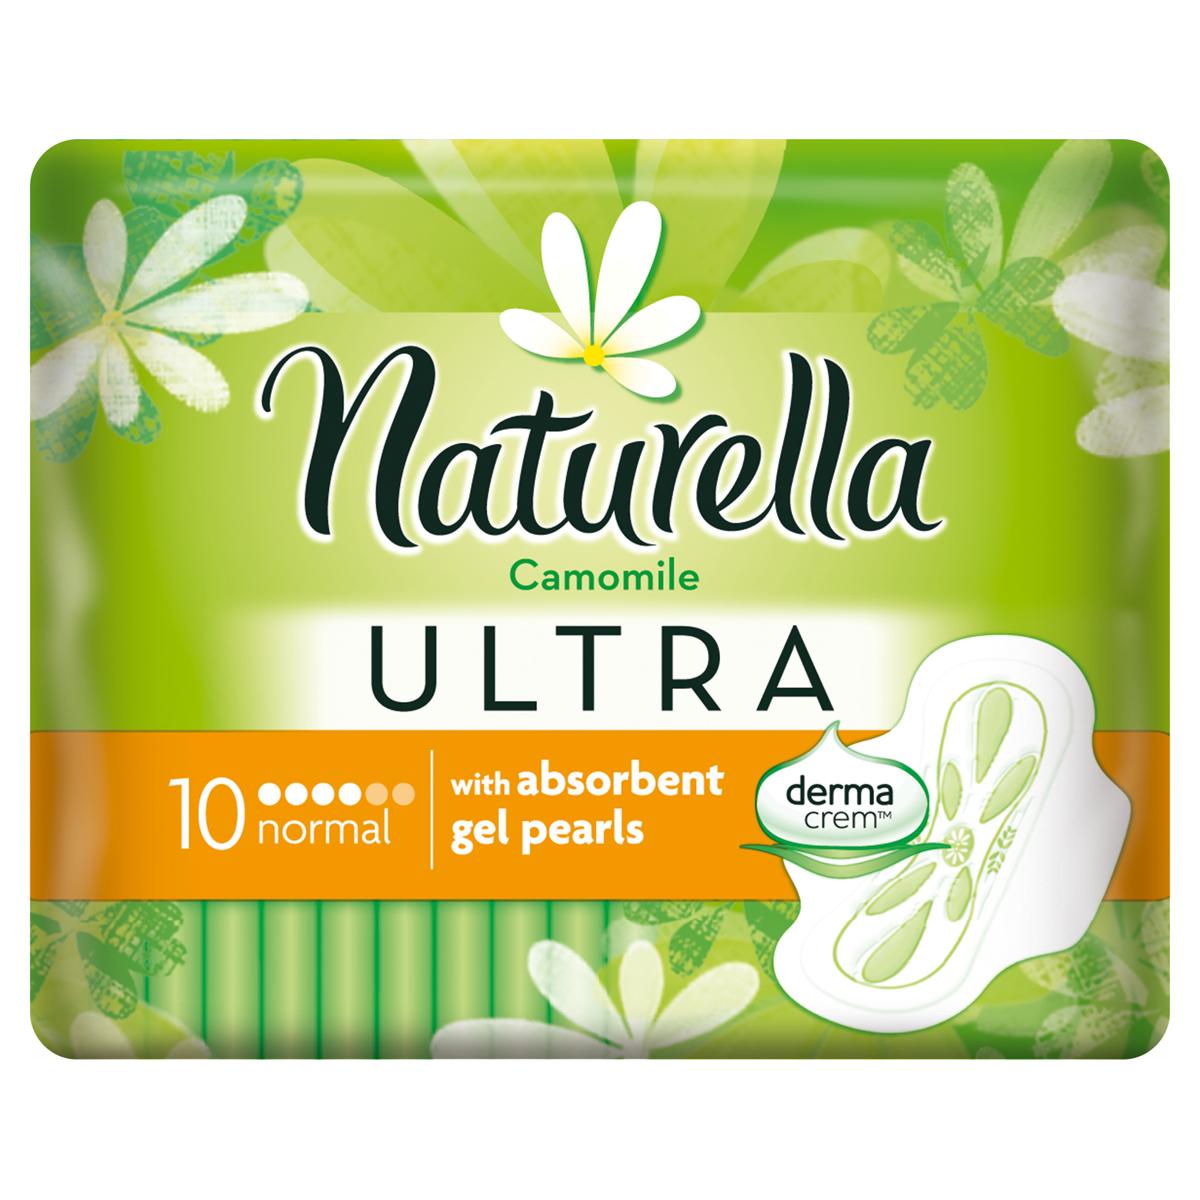 Naturella Ultra Женские гигиенические прокладки Camomile Normal Single 10шт